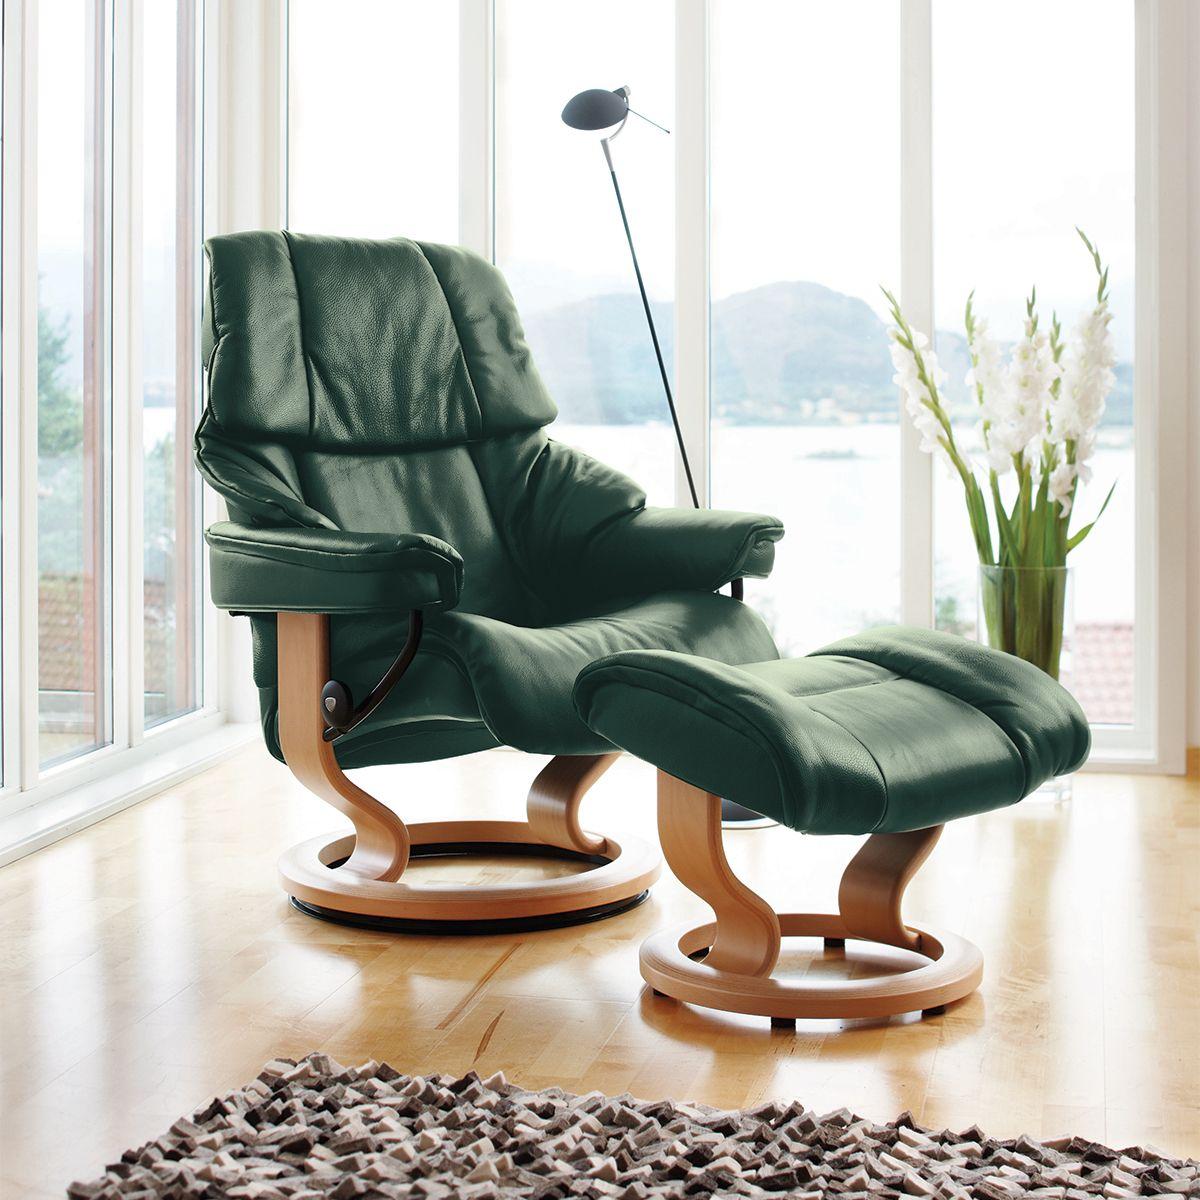 Stressless Reno | Stressless furniture, Stressless chair